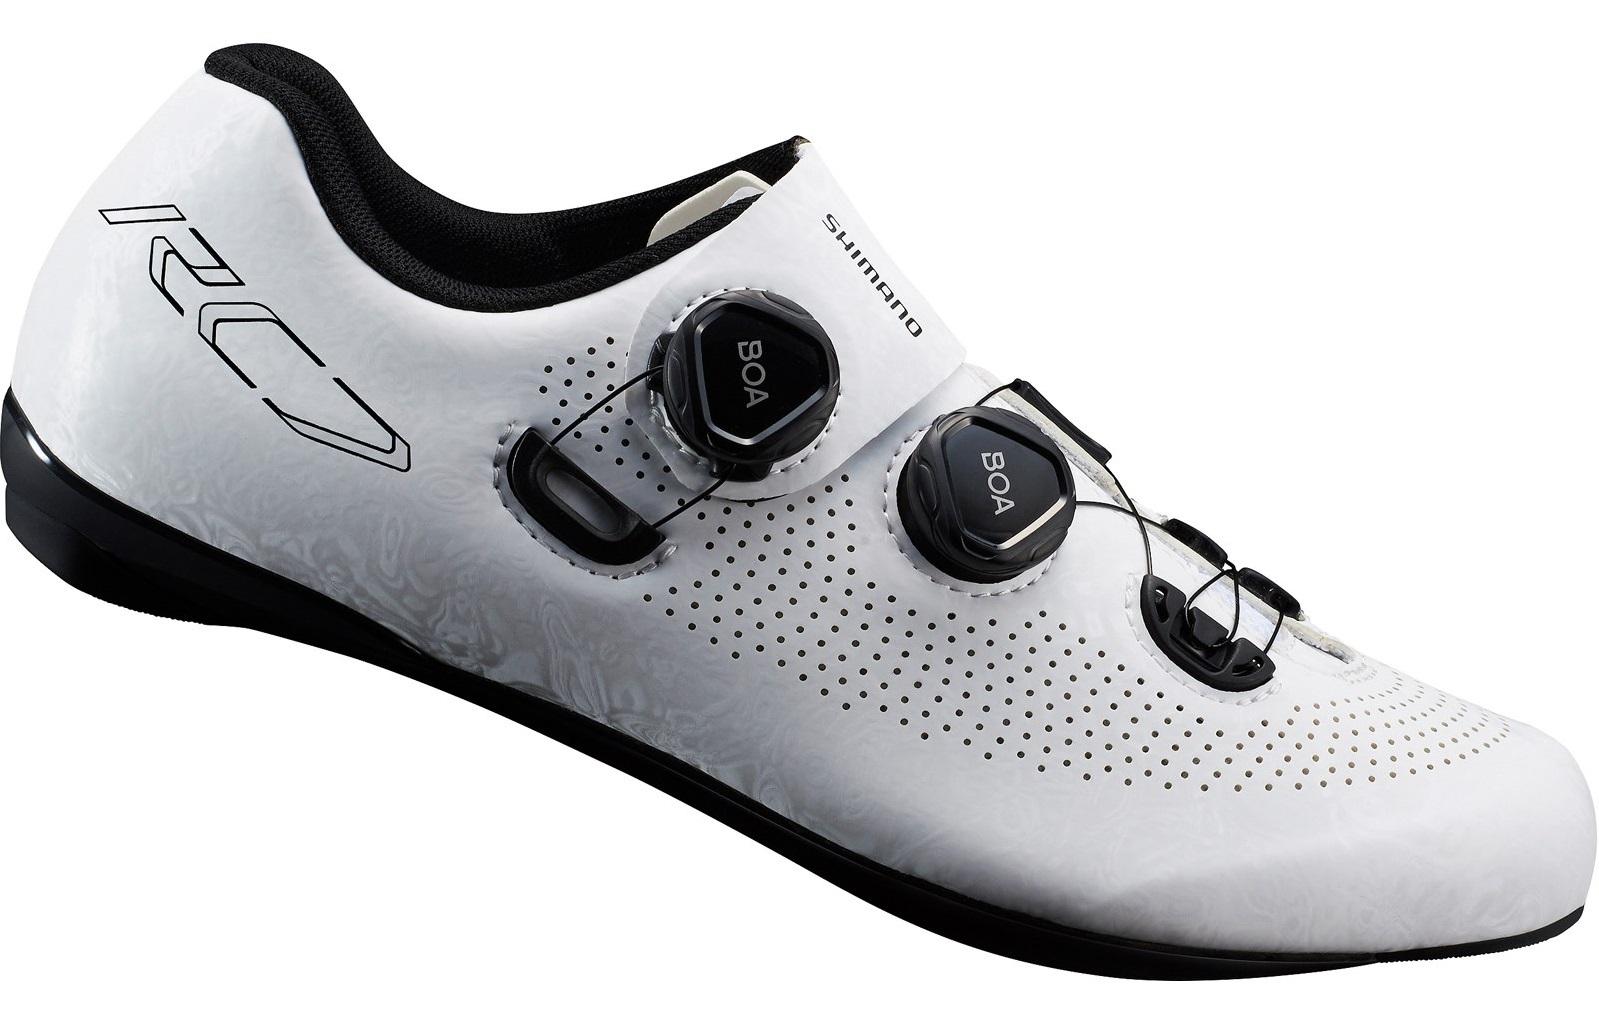 Čevlji shimano sh-rc7 (sh-rc701) white